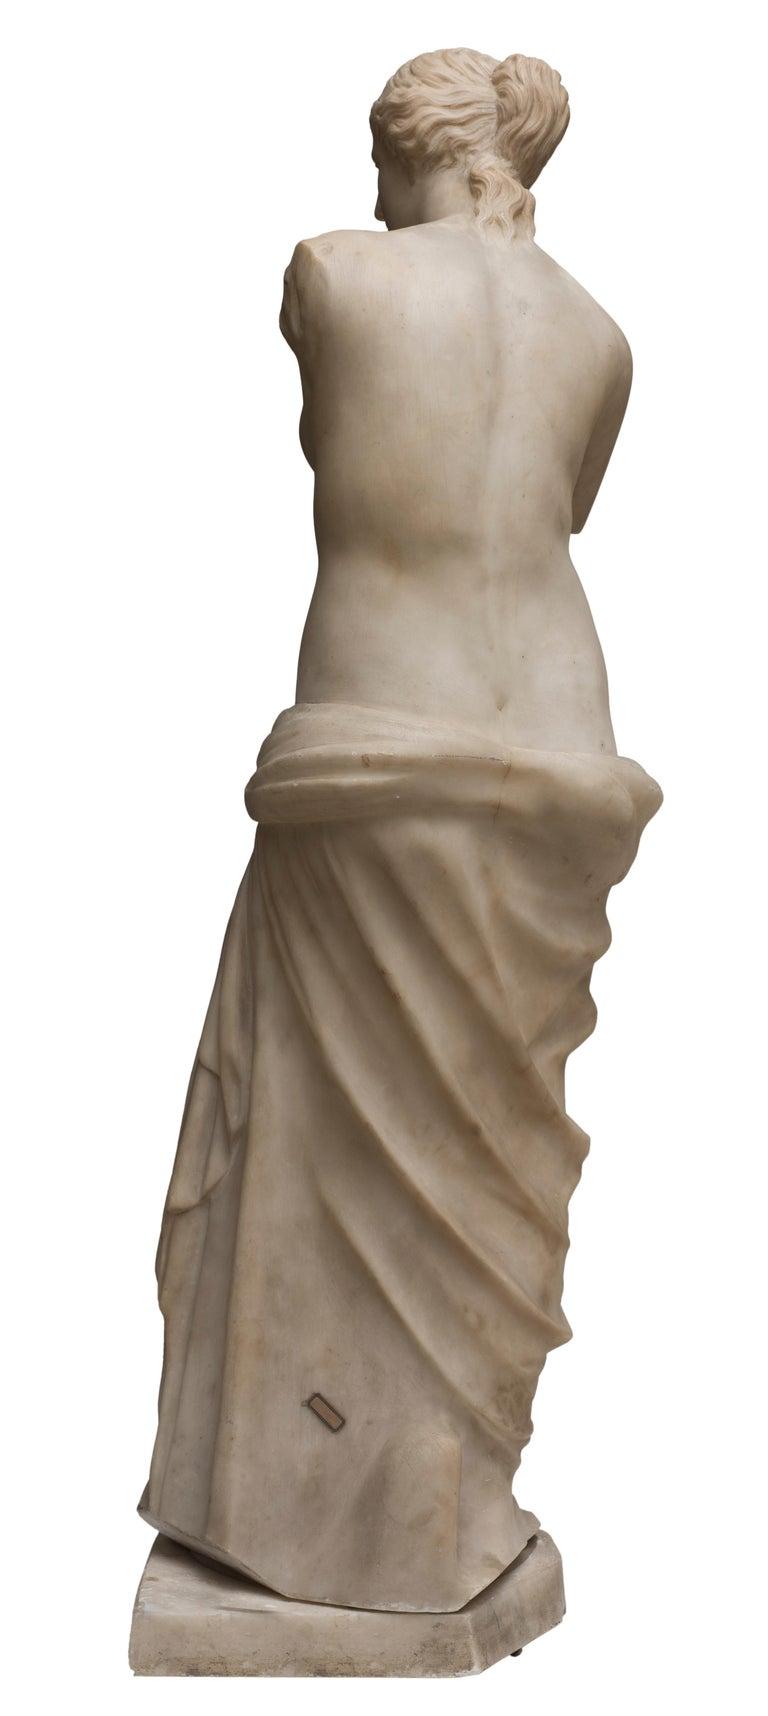 Carrara Marble Sculpture Copy of Venus de Milo by French Sculptor, circa 1820 In Good Condition For Sale In Roma, IT